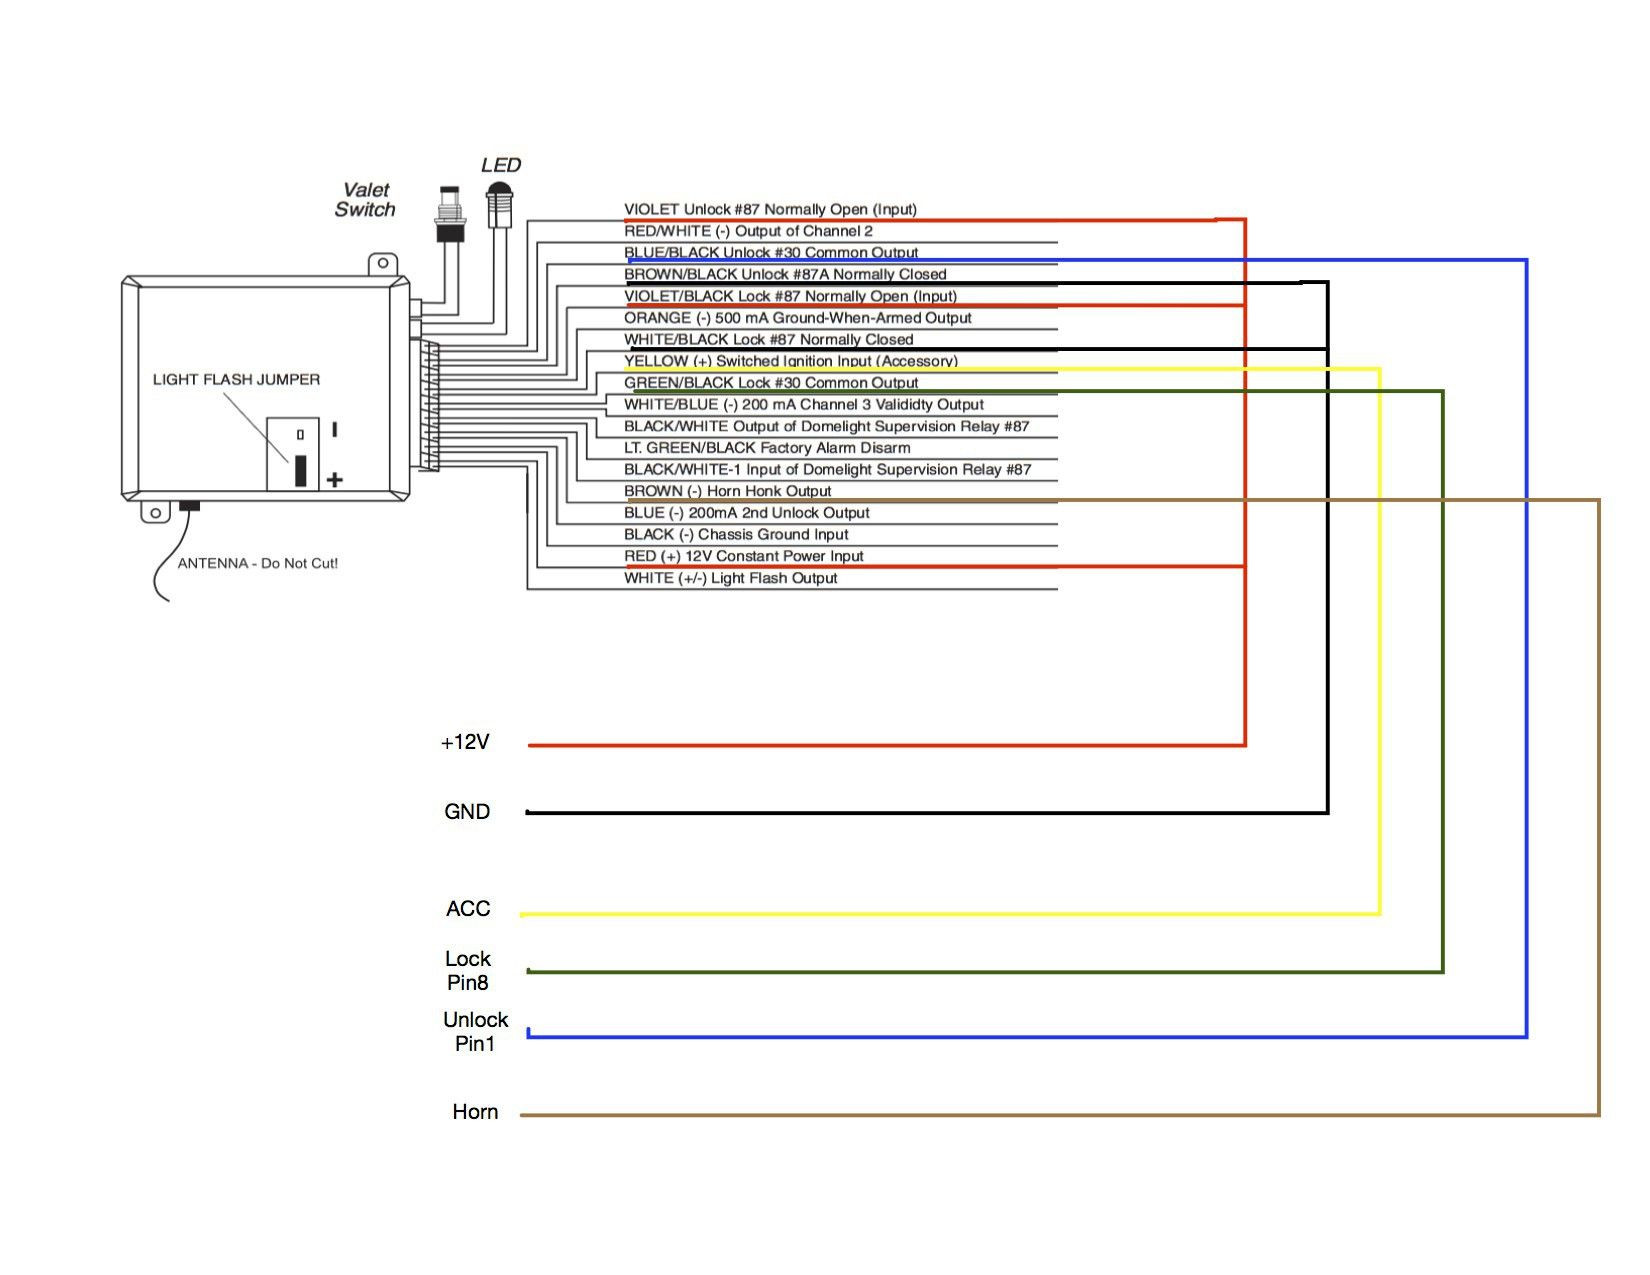 Viper 5706v Manual Pdf Diagram] Viper 5904 Wiring Diagram Full Version Hd Quality Wiring … Of Viper 5706v Manual Pdf